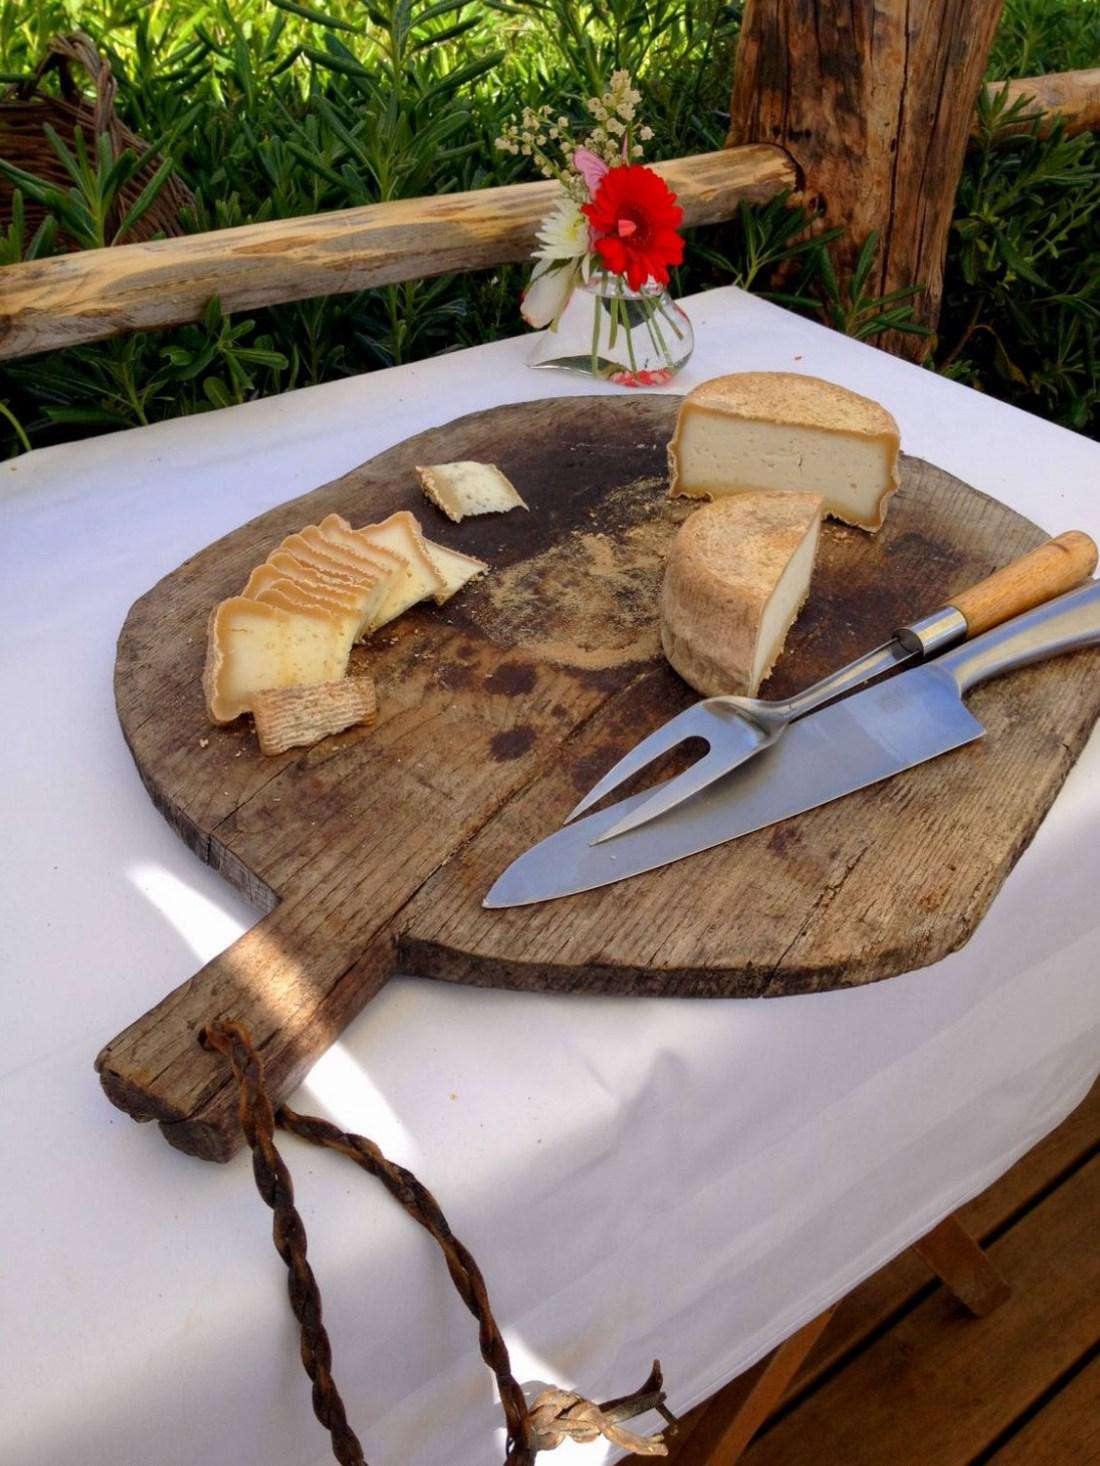 Ewe Corsican cheese at the Villa Guidi - Pila-Canale, Corsica, France